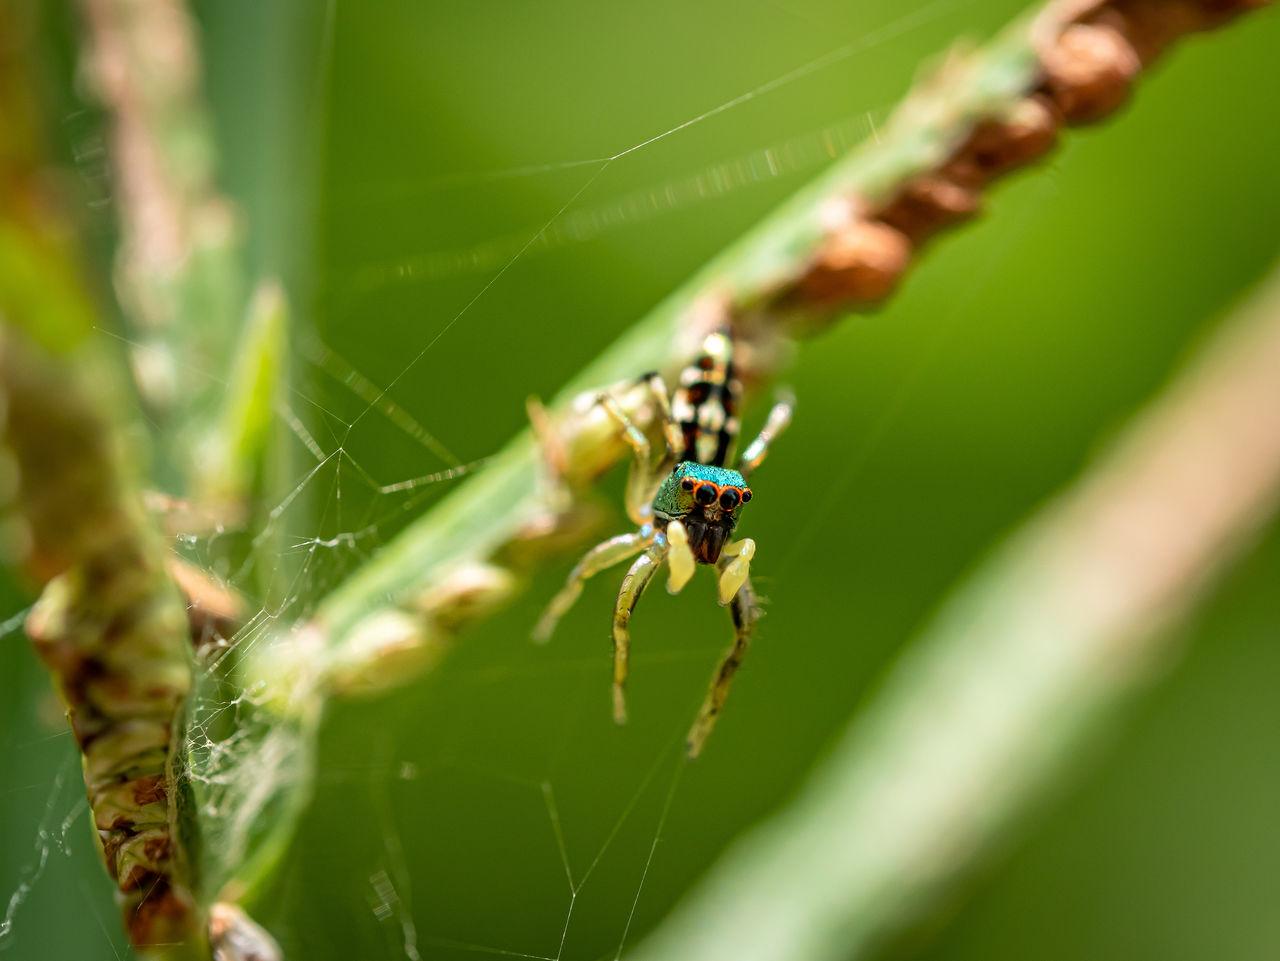 Close-up spider web